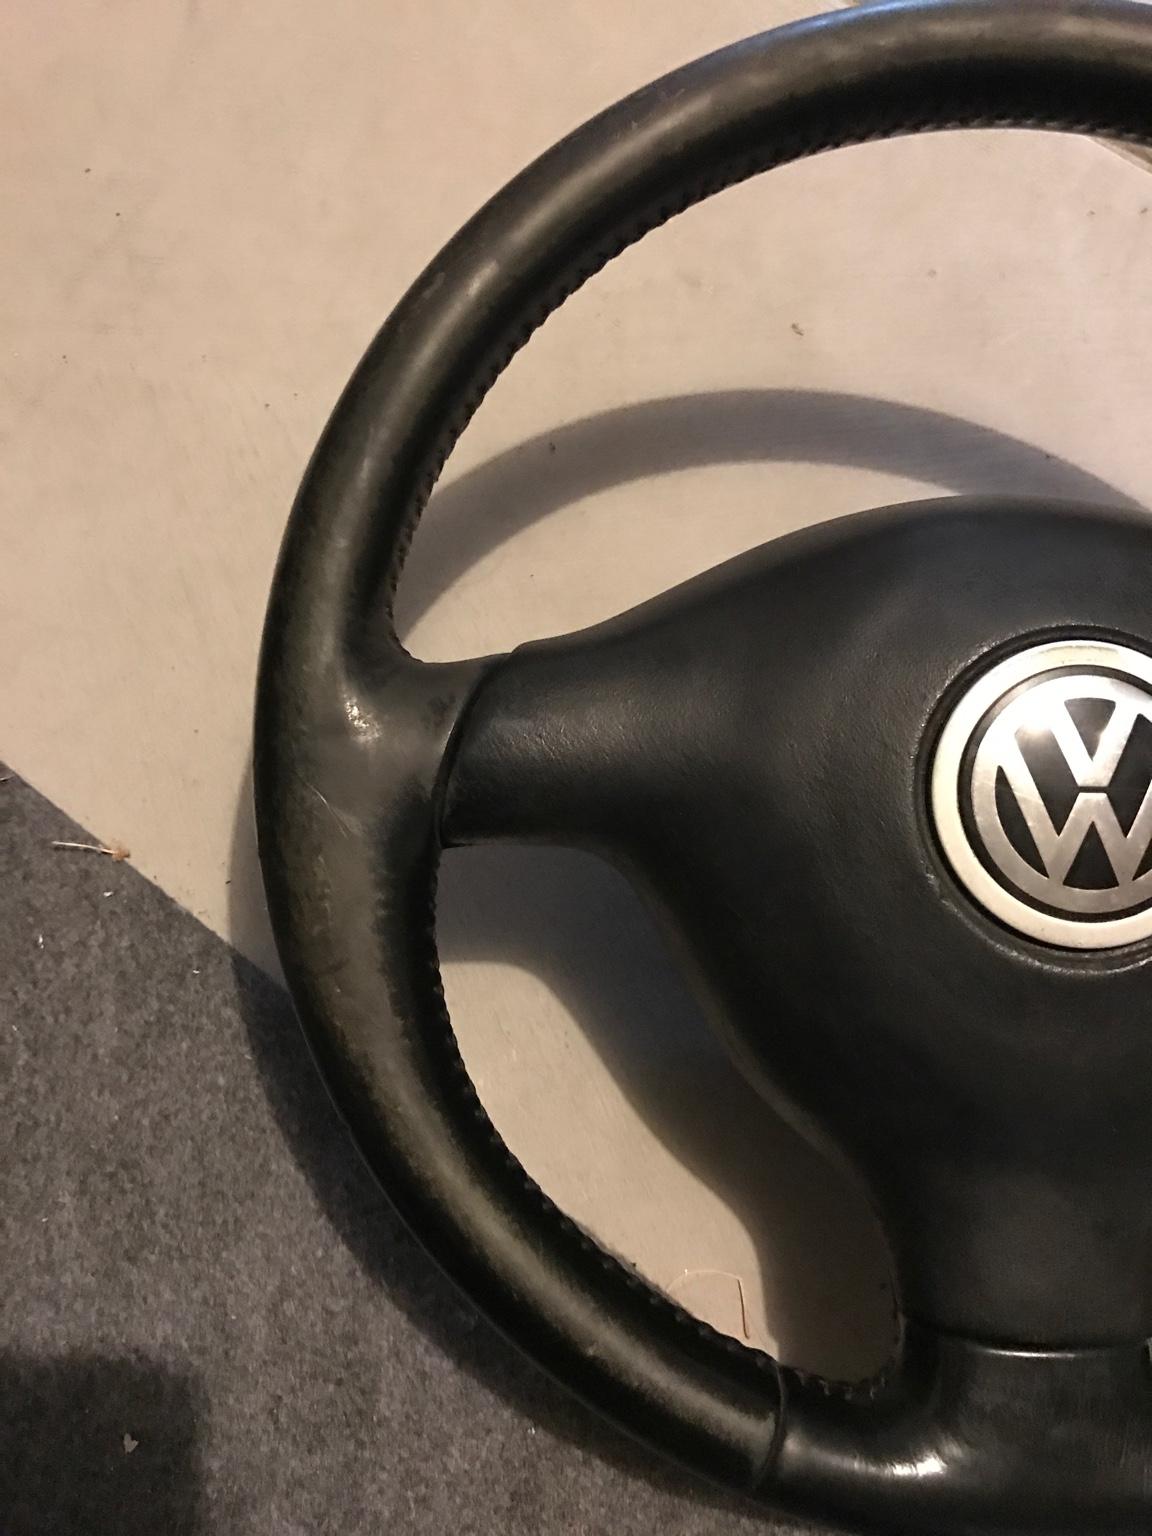 VWVortex com - FS: Three spoke steering wheel, radio cage